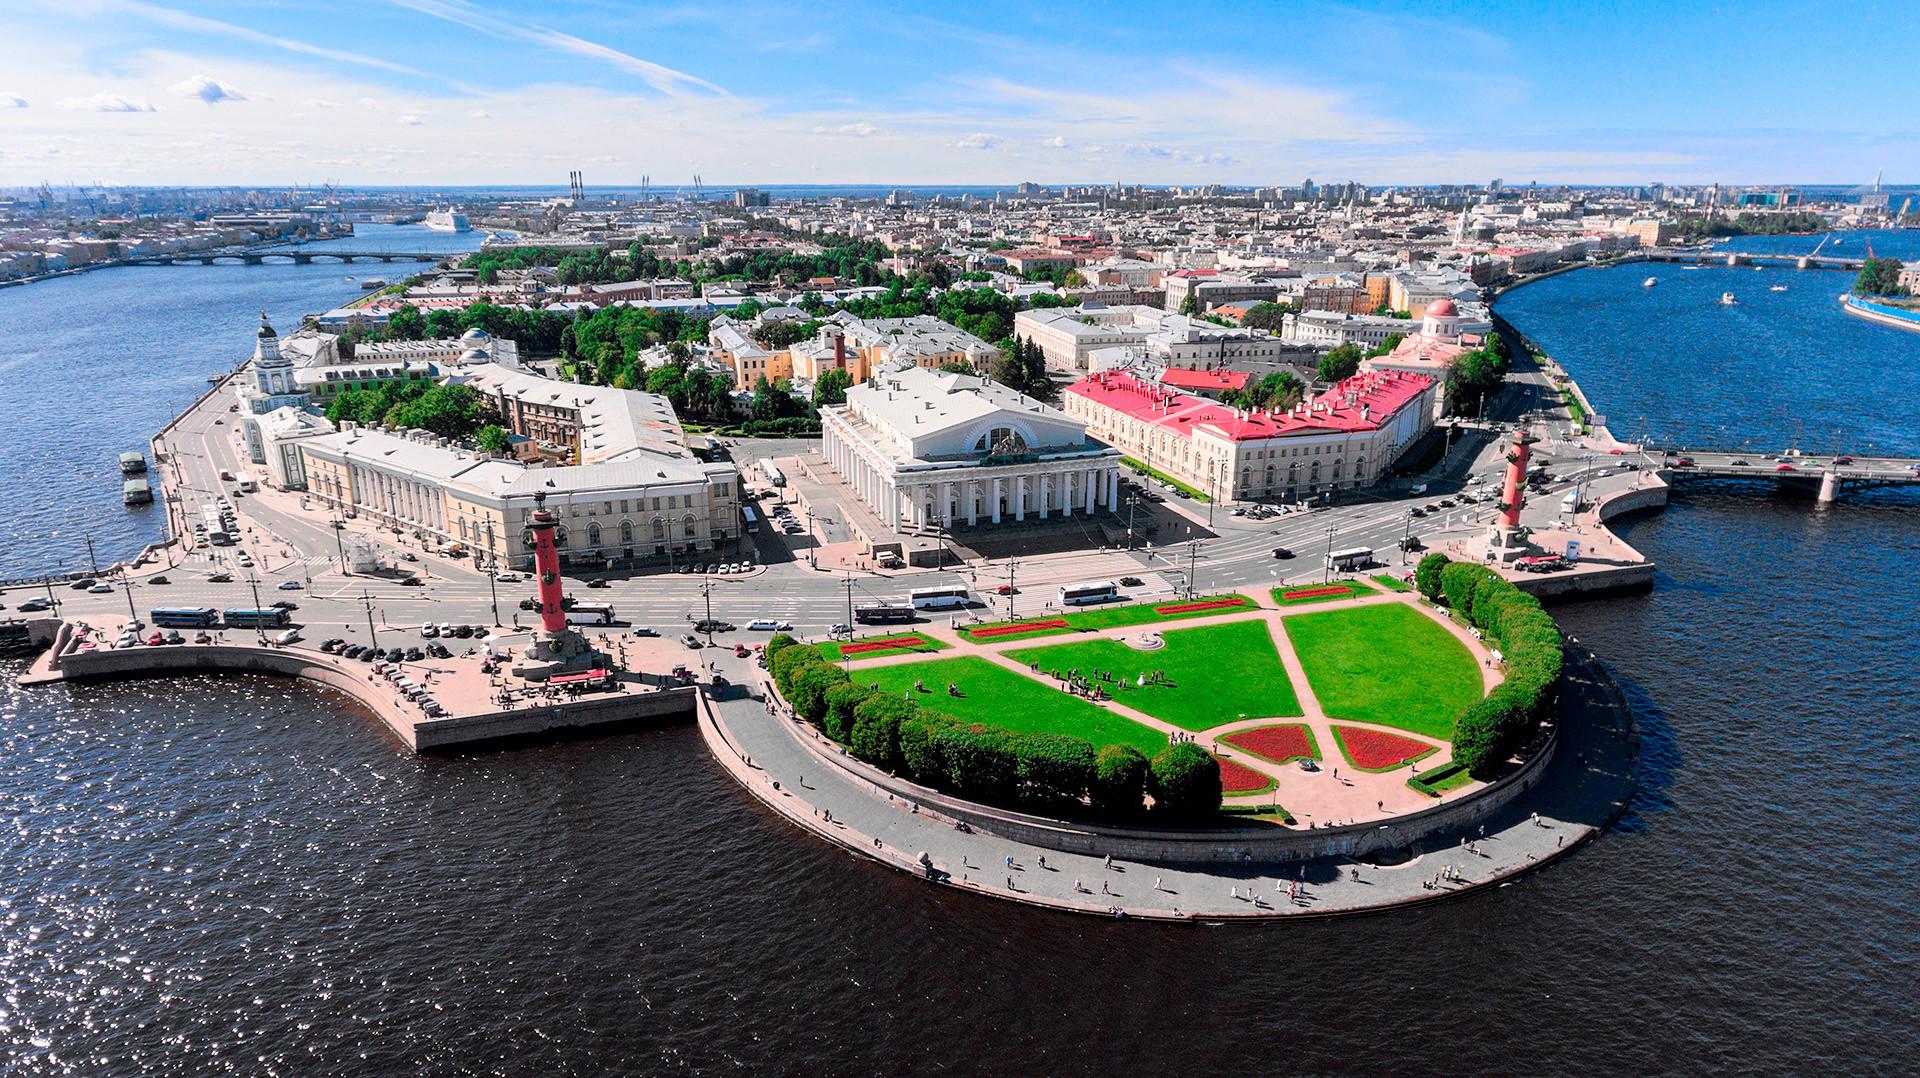 Изглед отгоре към Василиевския остров, Санкт Петербург.